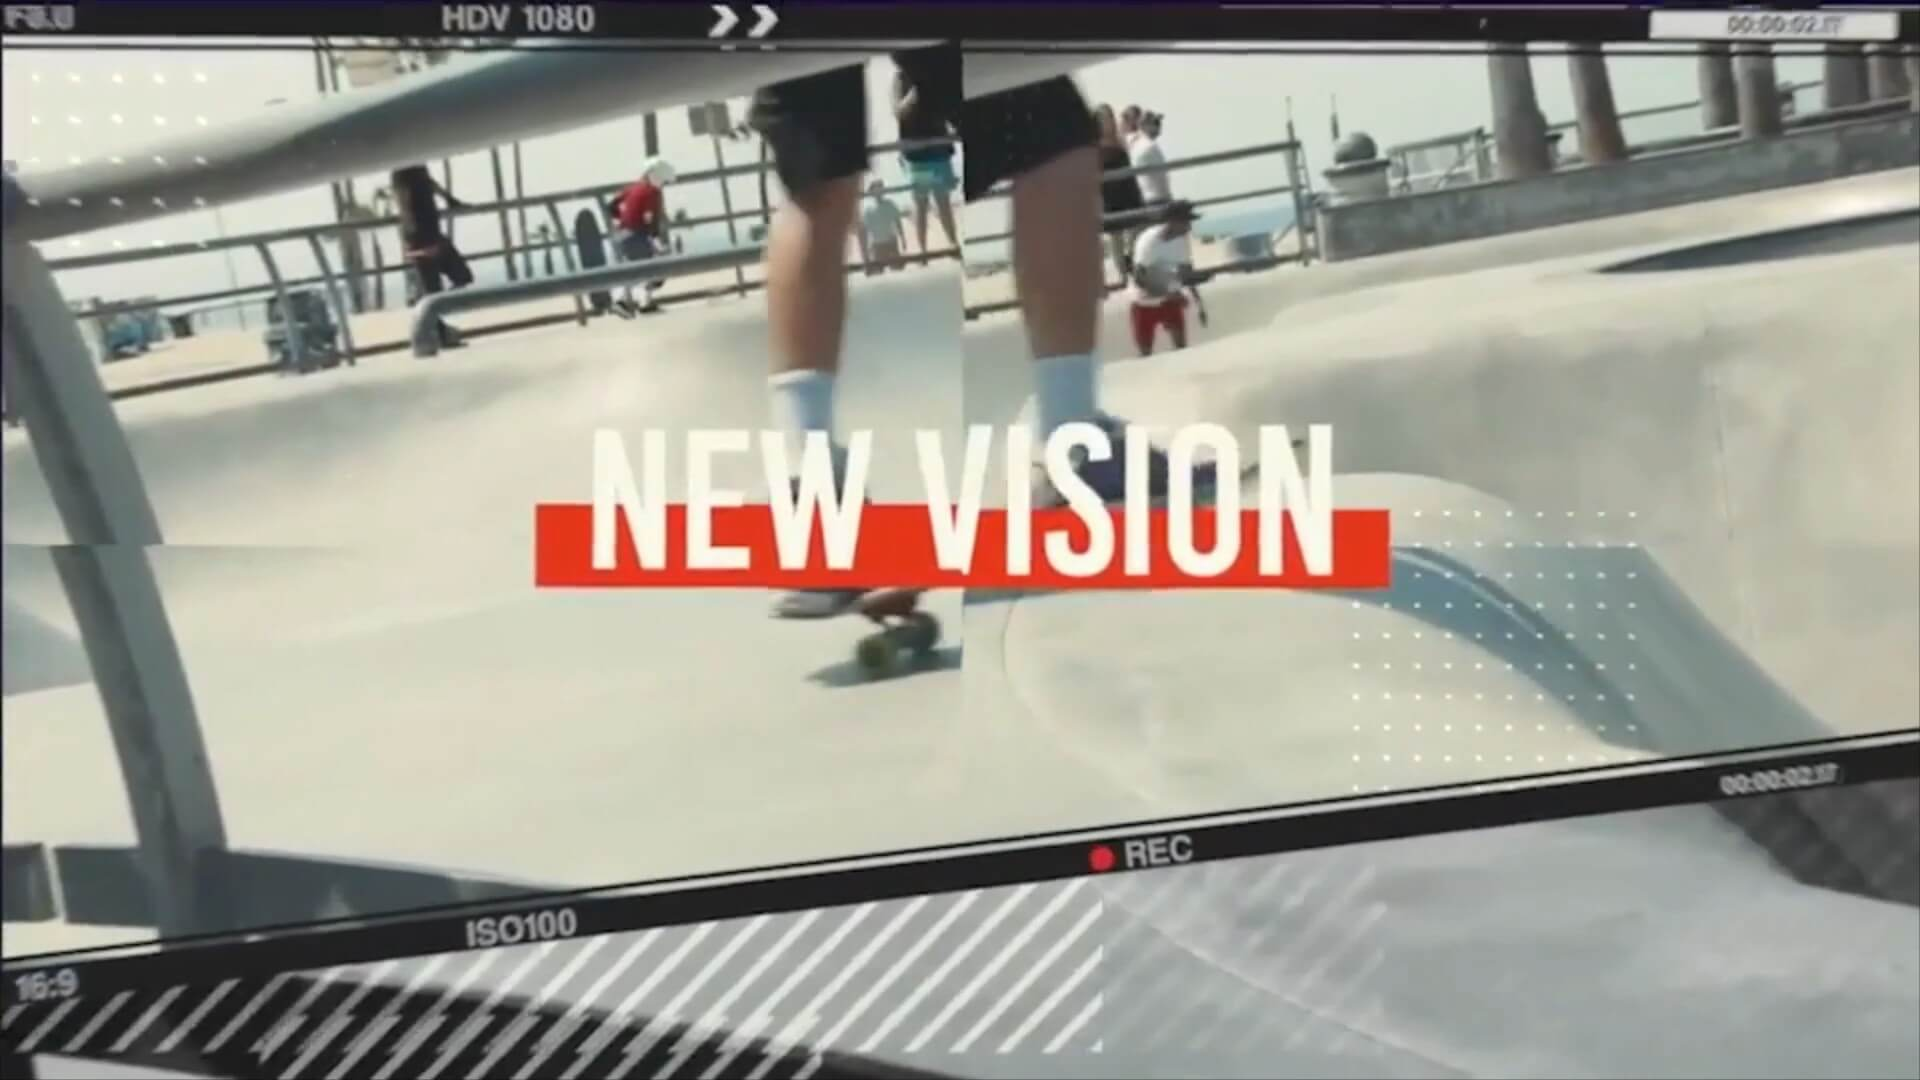 fcpx主题模板 炫酷现代都市时尚个性图文视频展示片头 Urban Frames